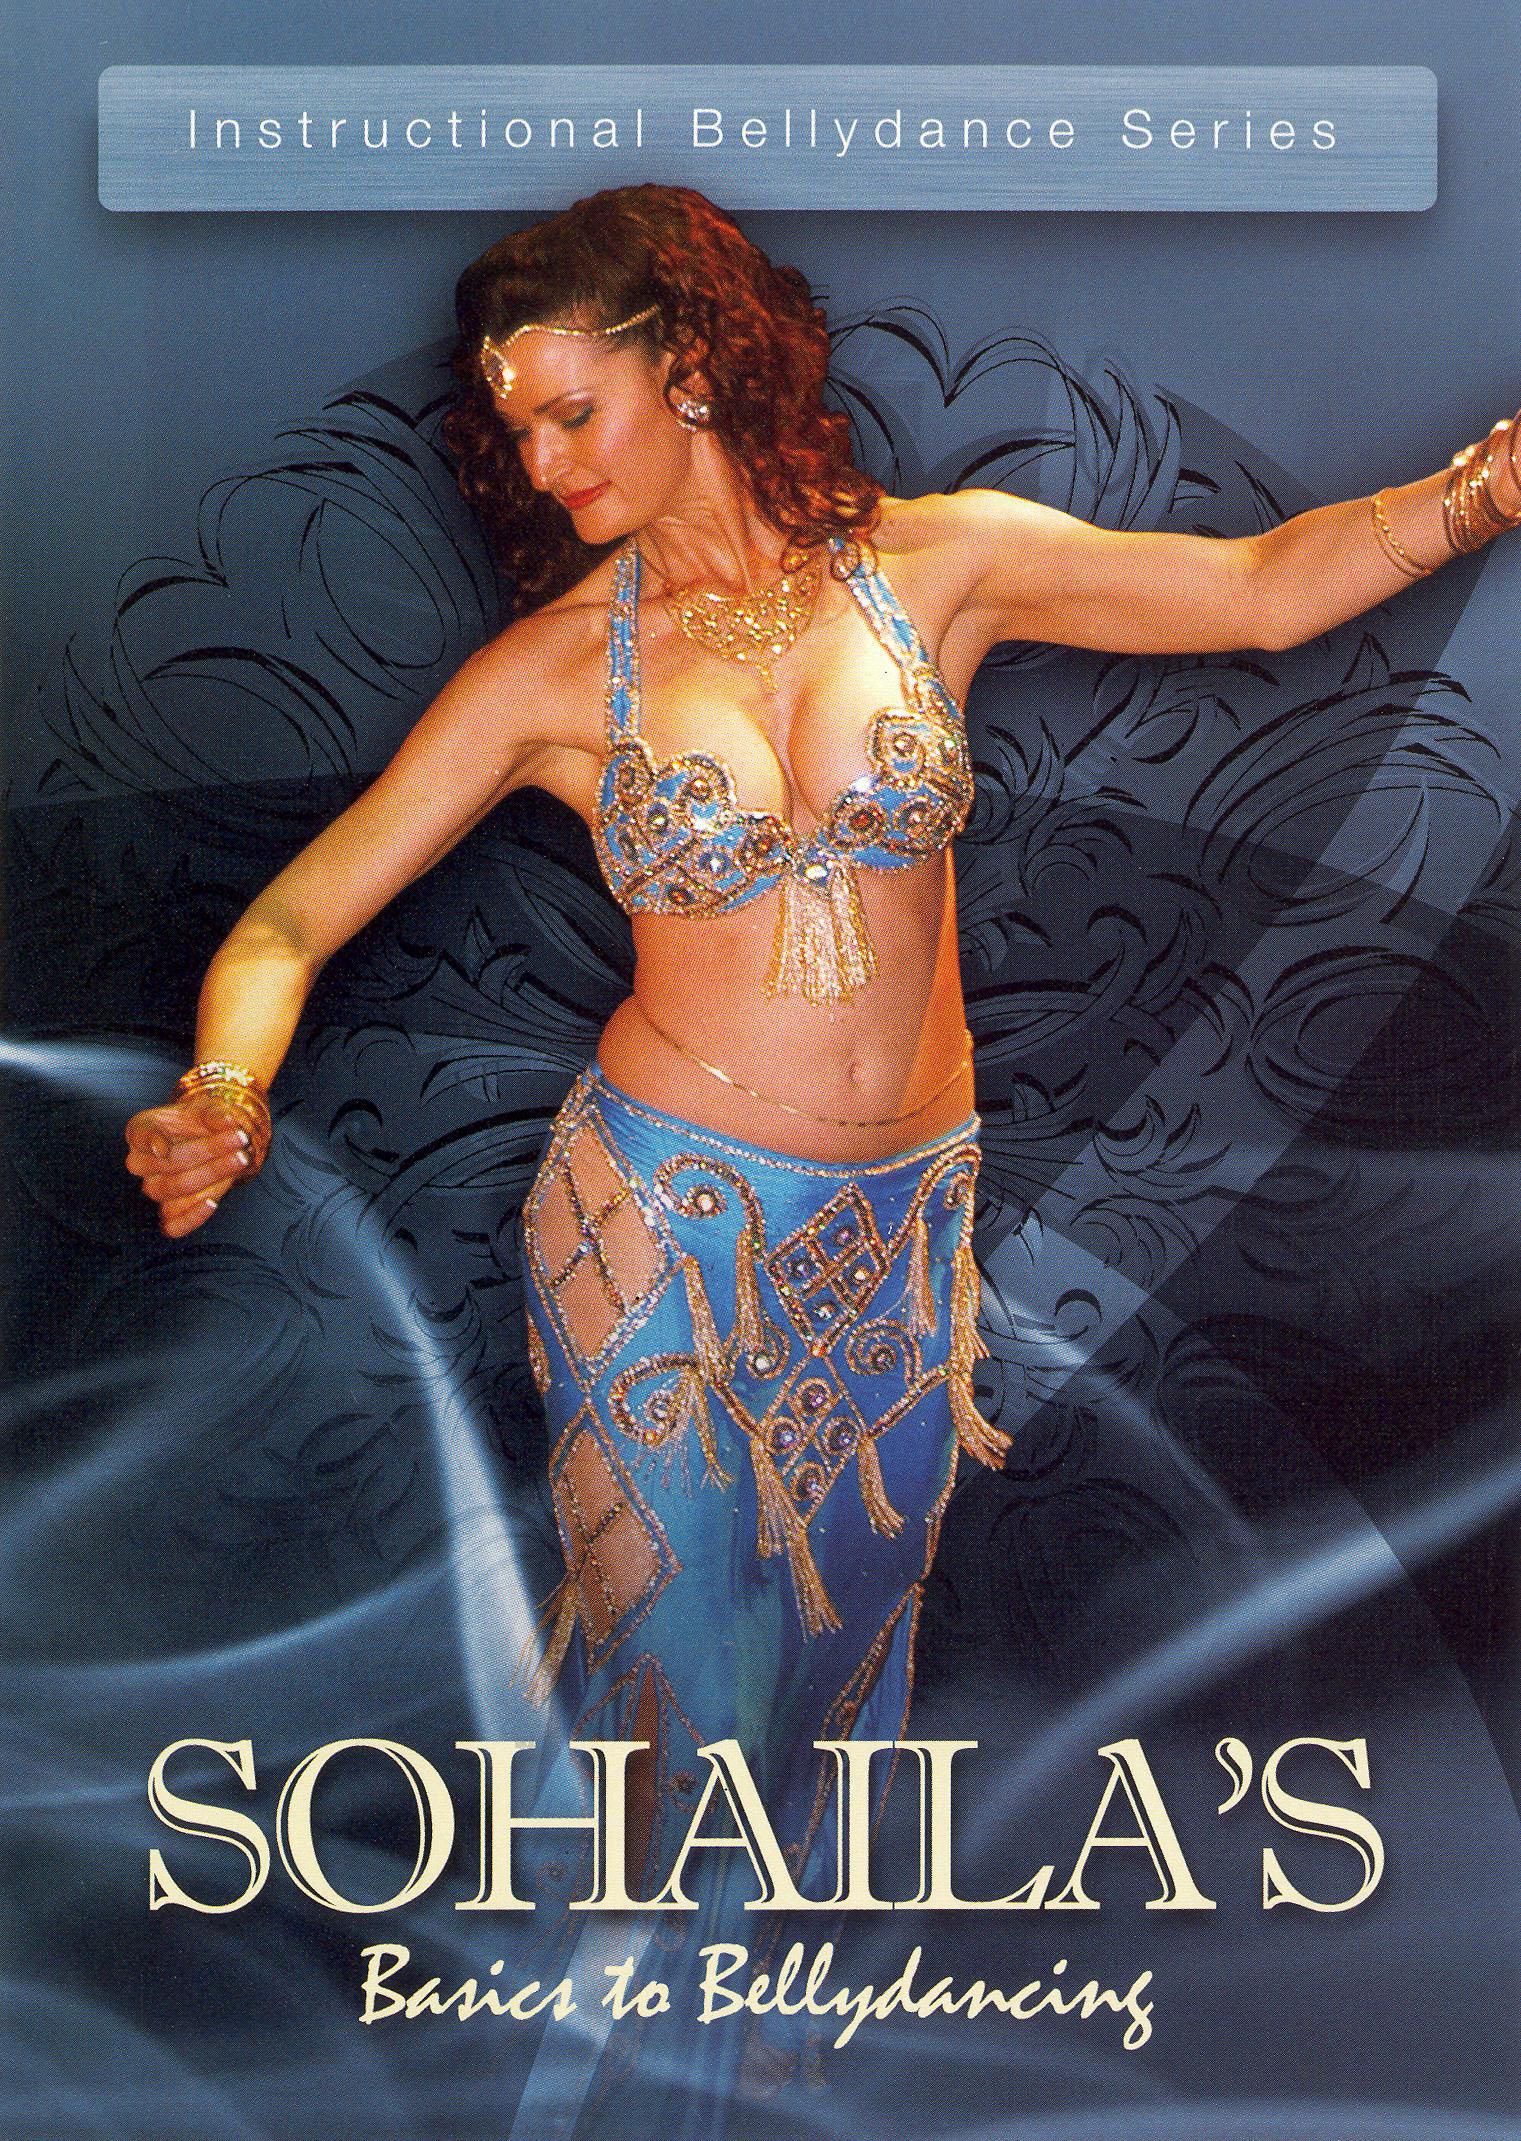 Sohaila's Basics to Bellydancing